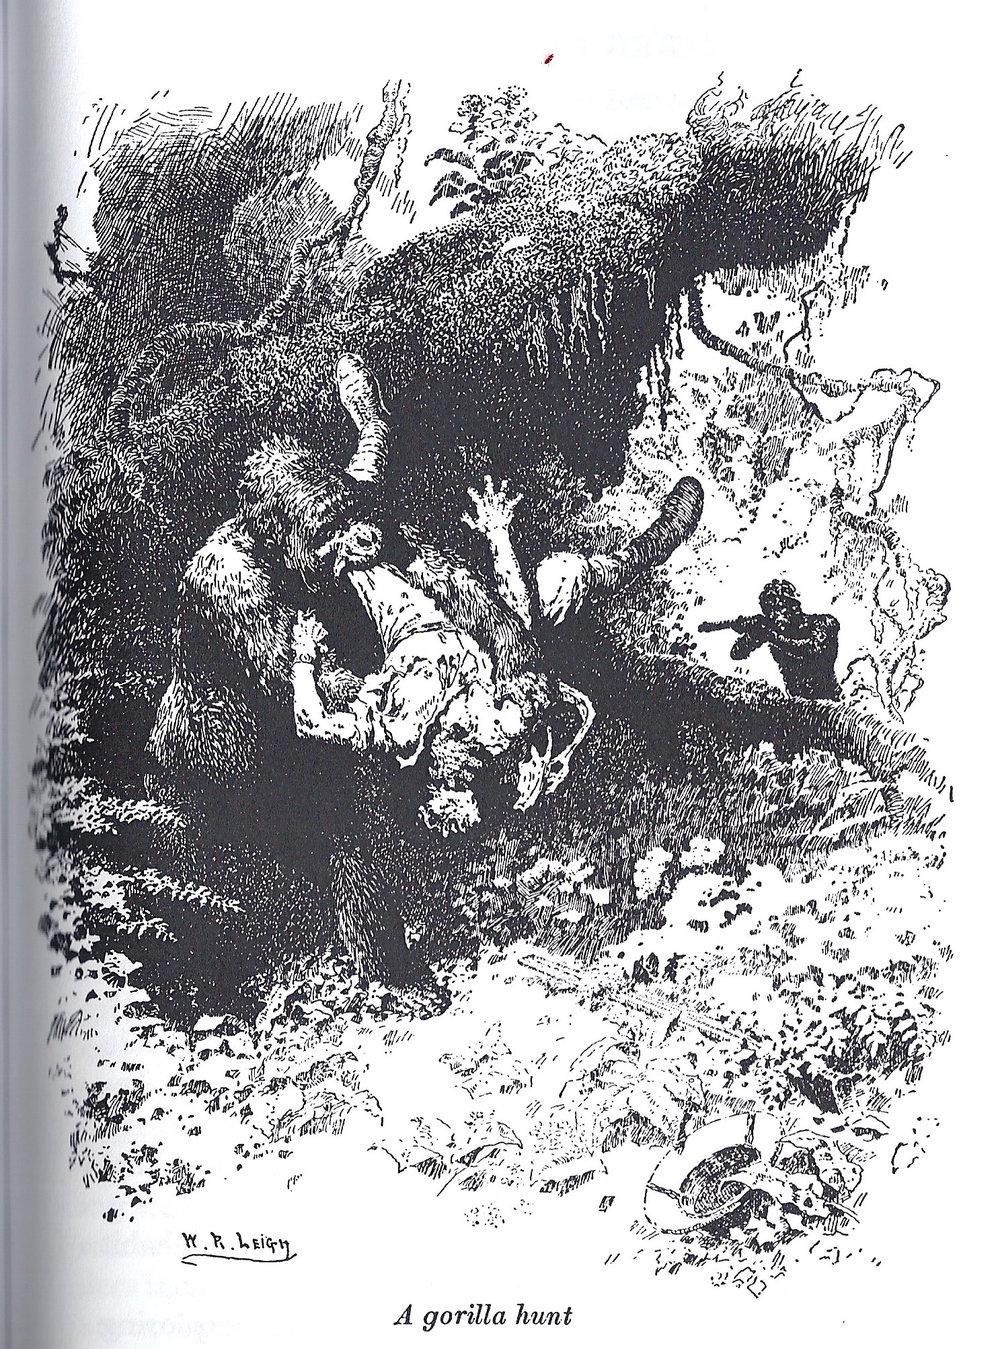 A Gorilla hunt